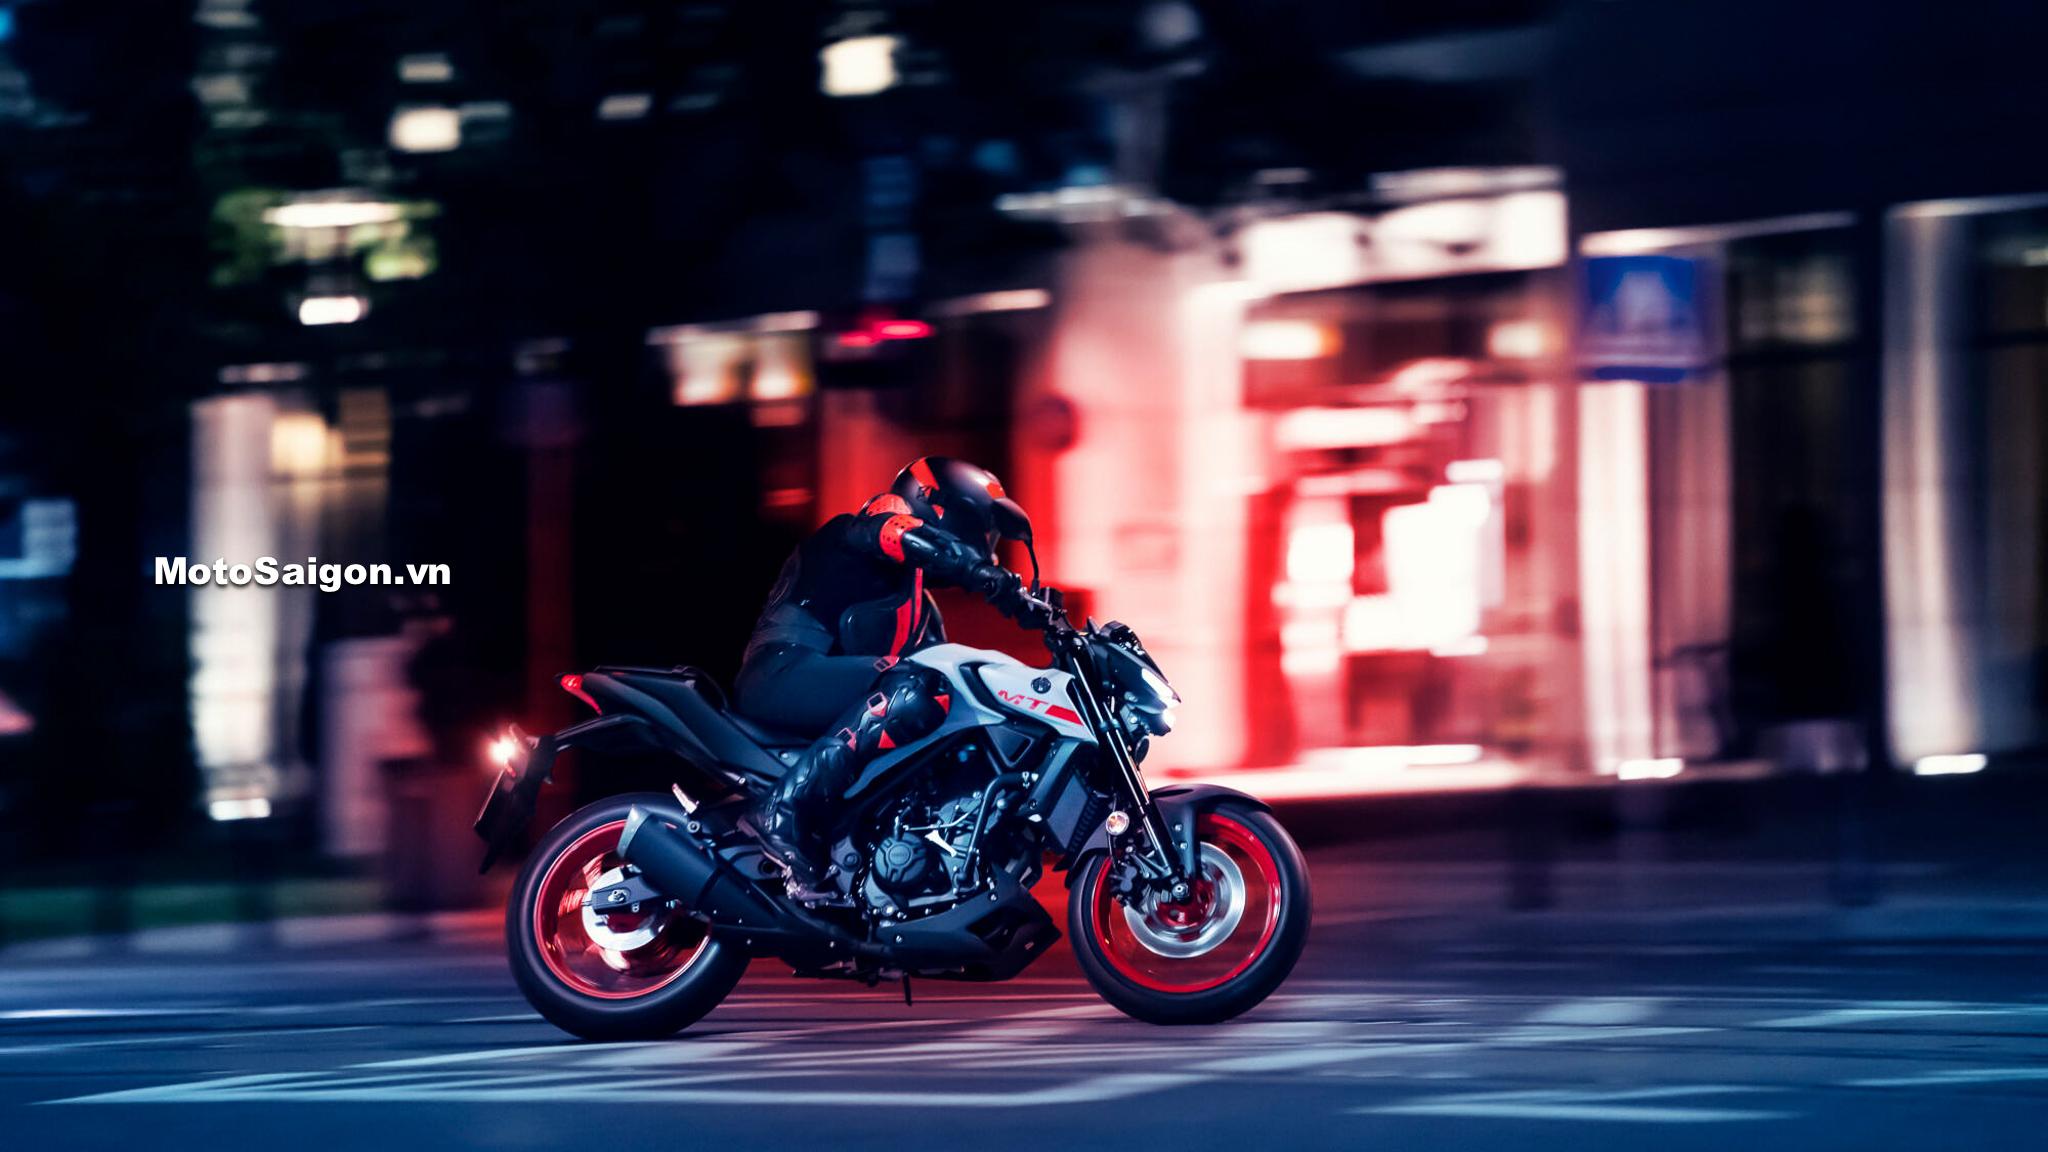 yamaha mt 03 abs 2020 danh gia xe motosaigon 4